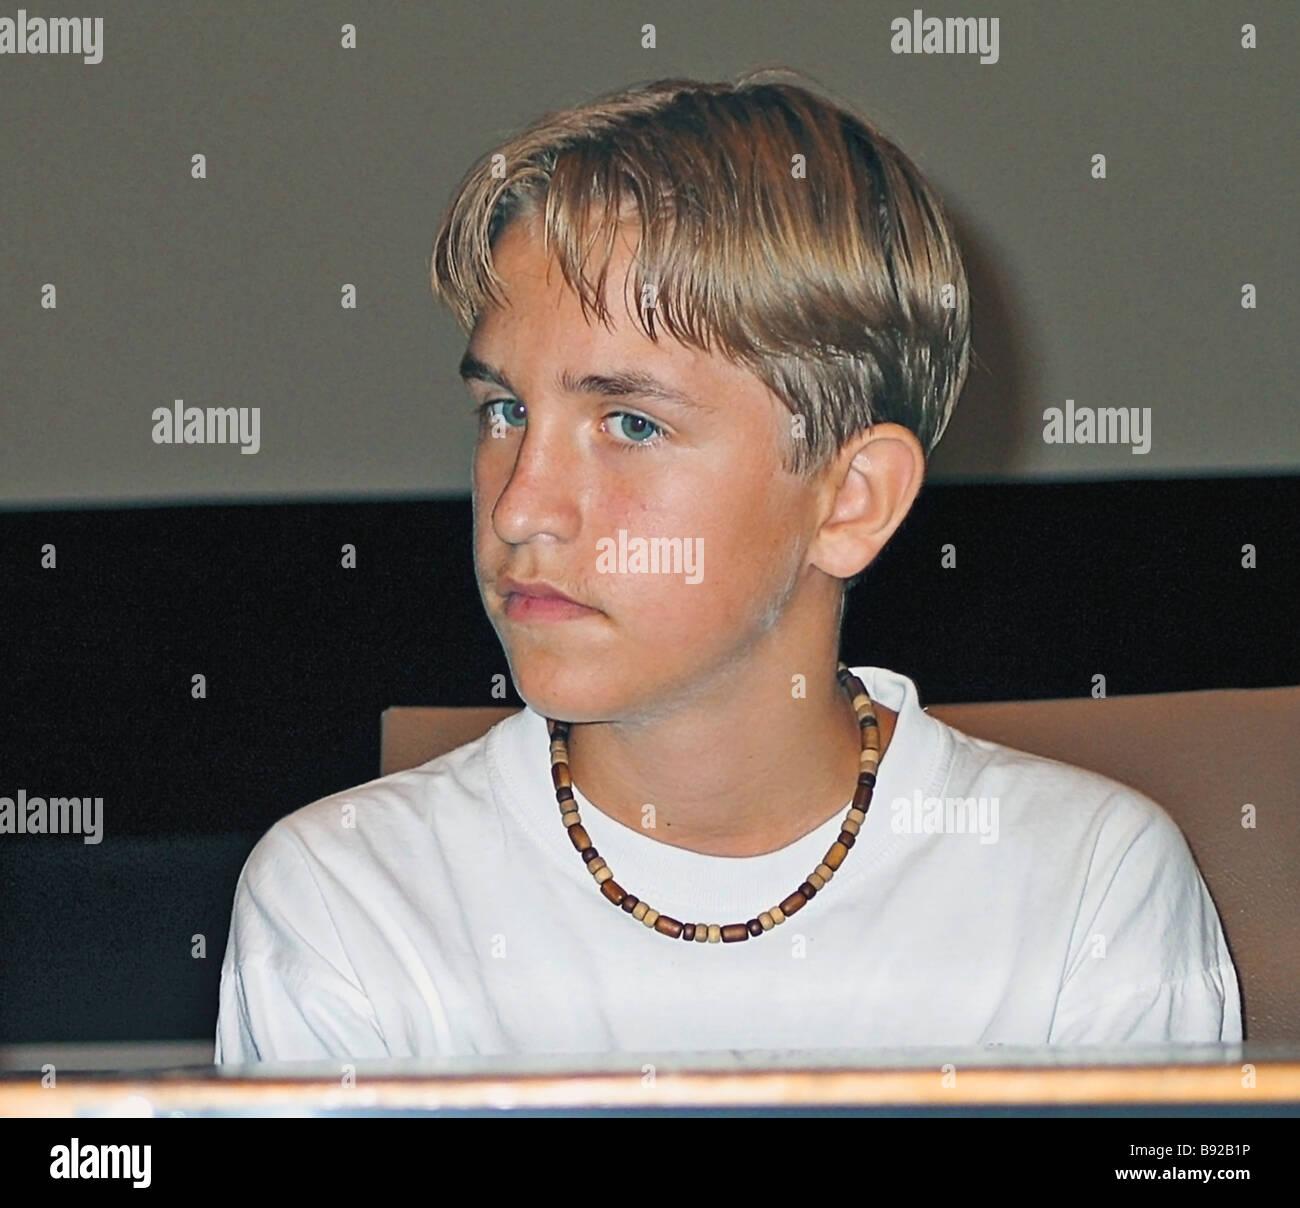 Personal life of Ivan Dobronravov